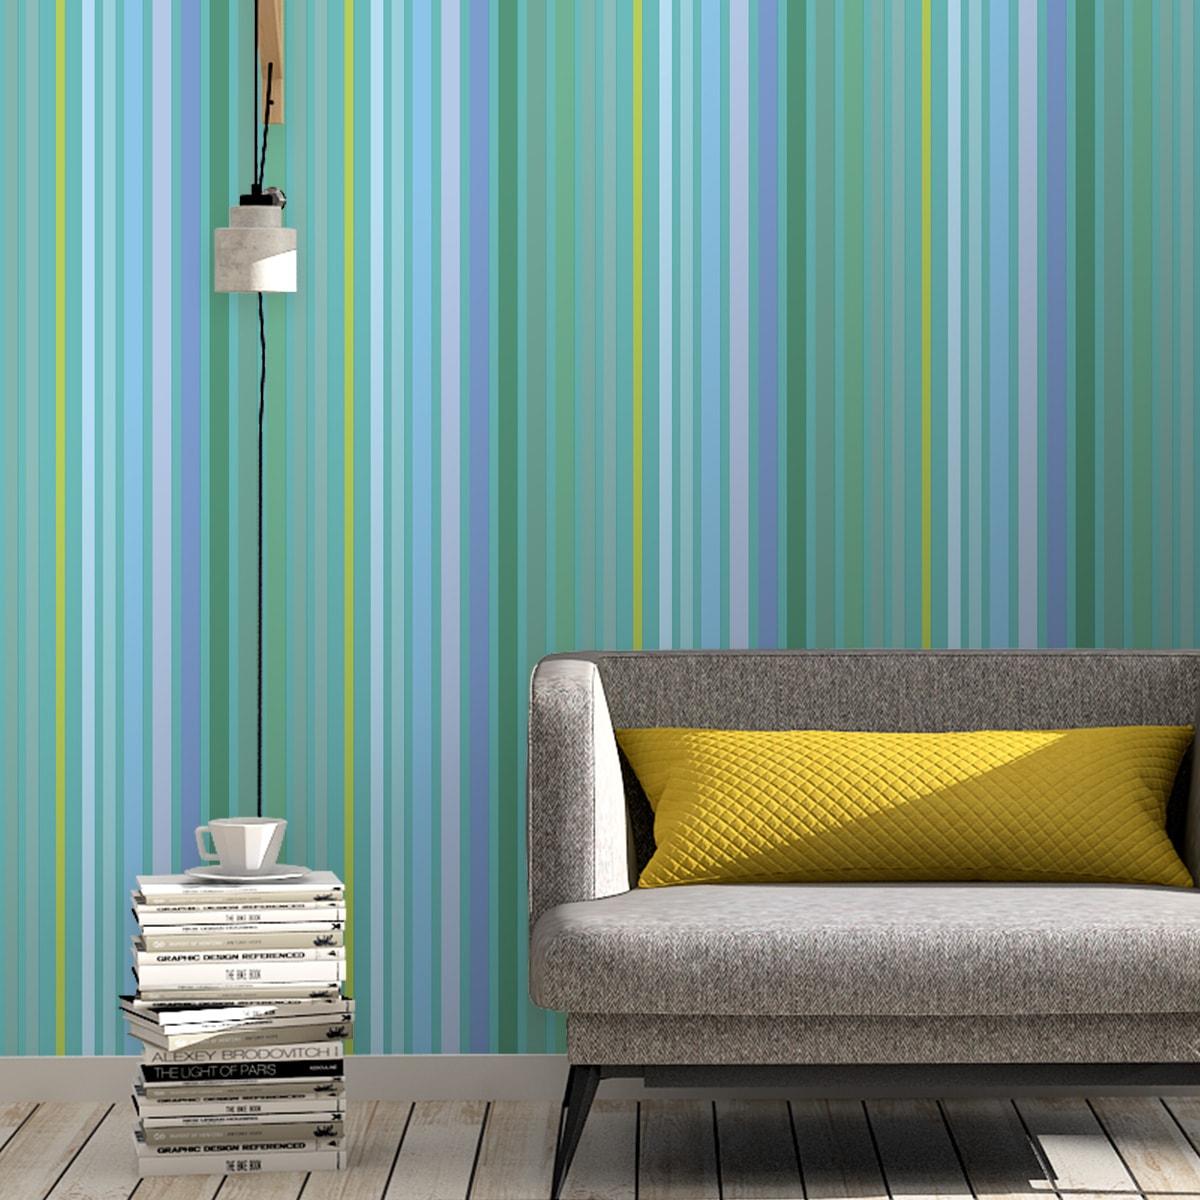 Été c'est moi - elegante Tapete aus der Tapeten Design Familie: -0043 als Naturaltouch Luxus Vliestapete oder Basic Vliestapete